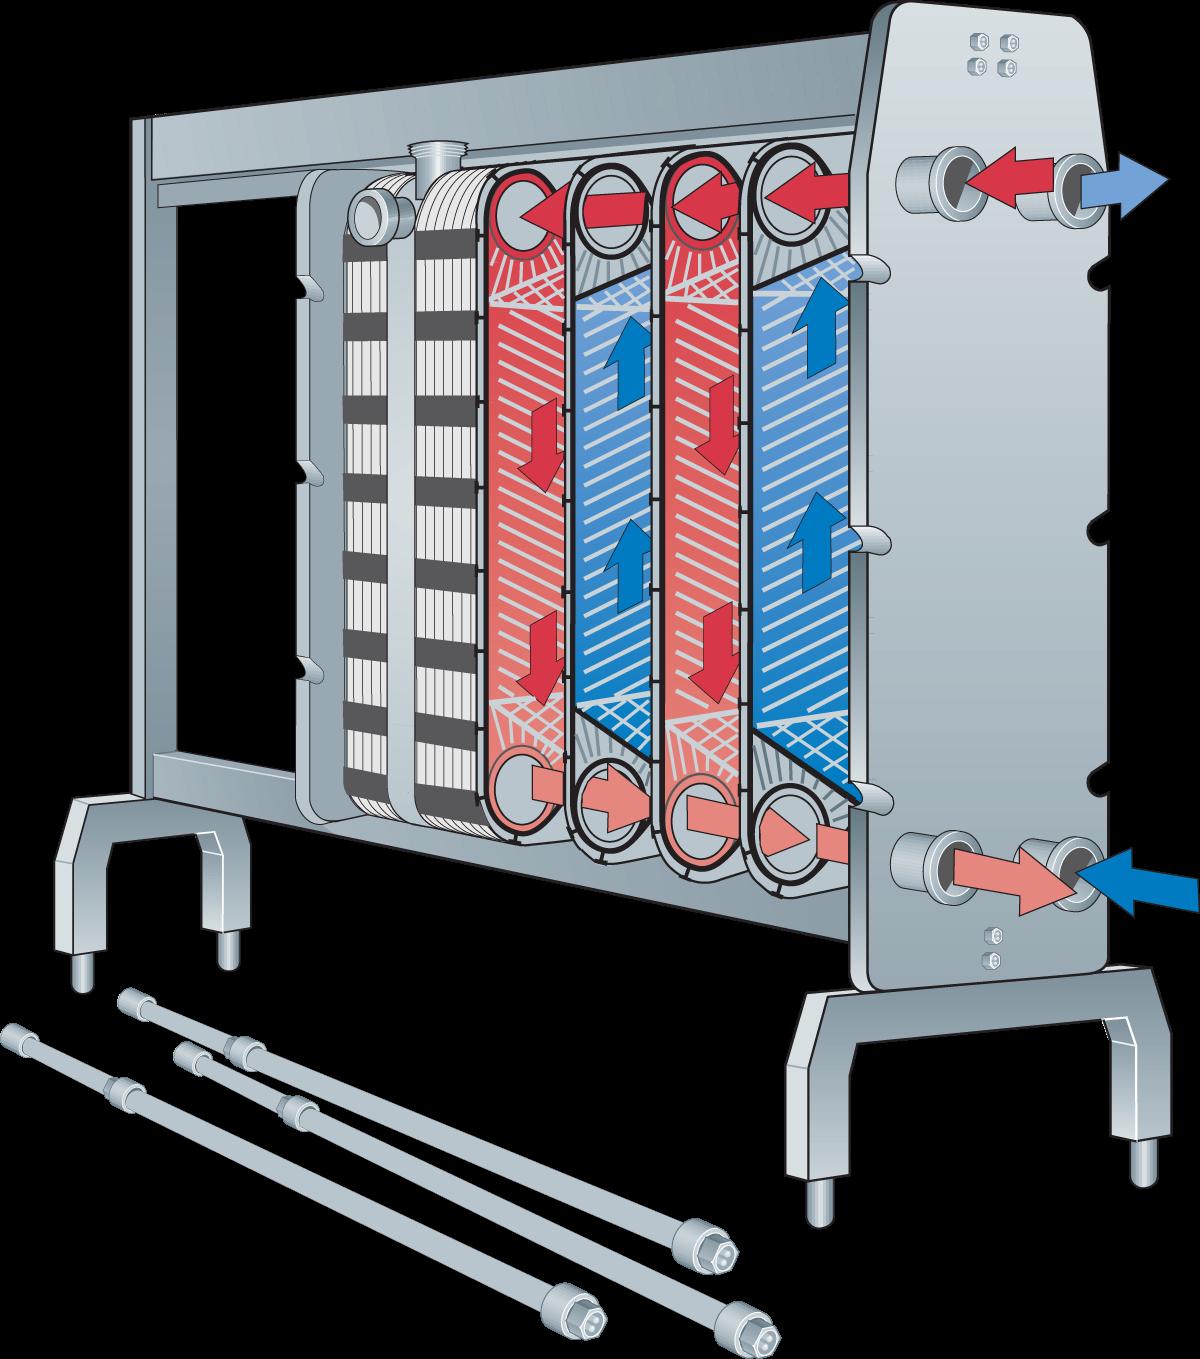 Applications of Plate Heat Exchangers in Beverage Industry